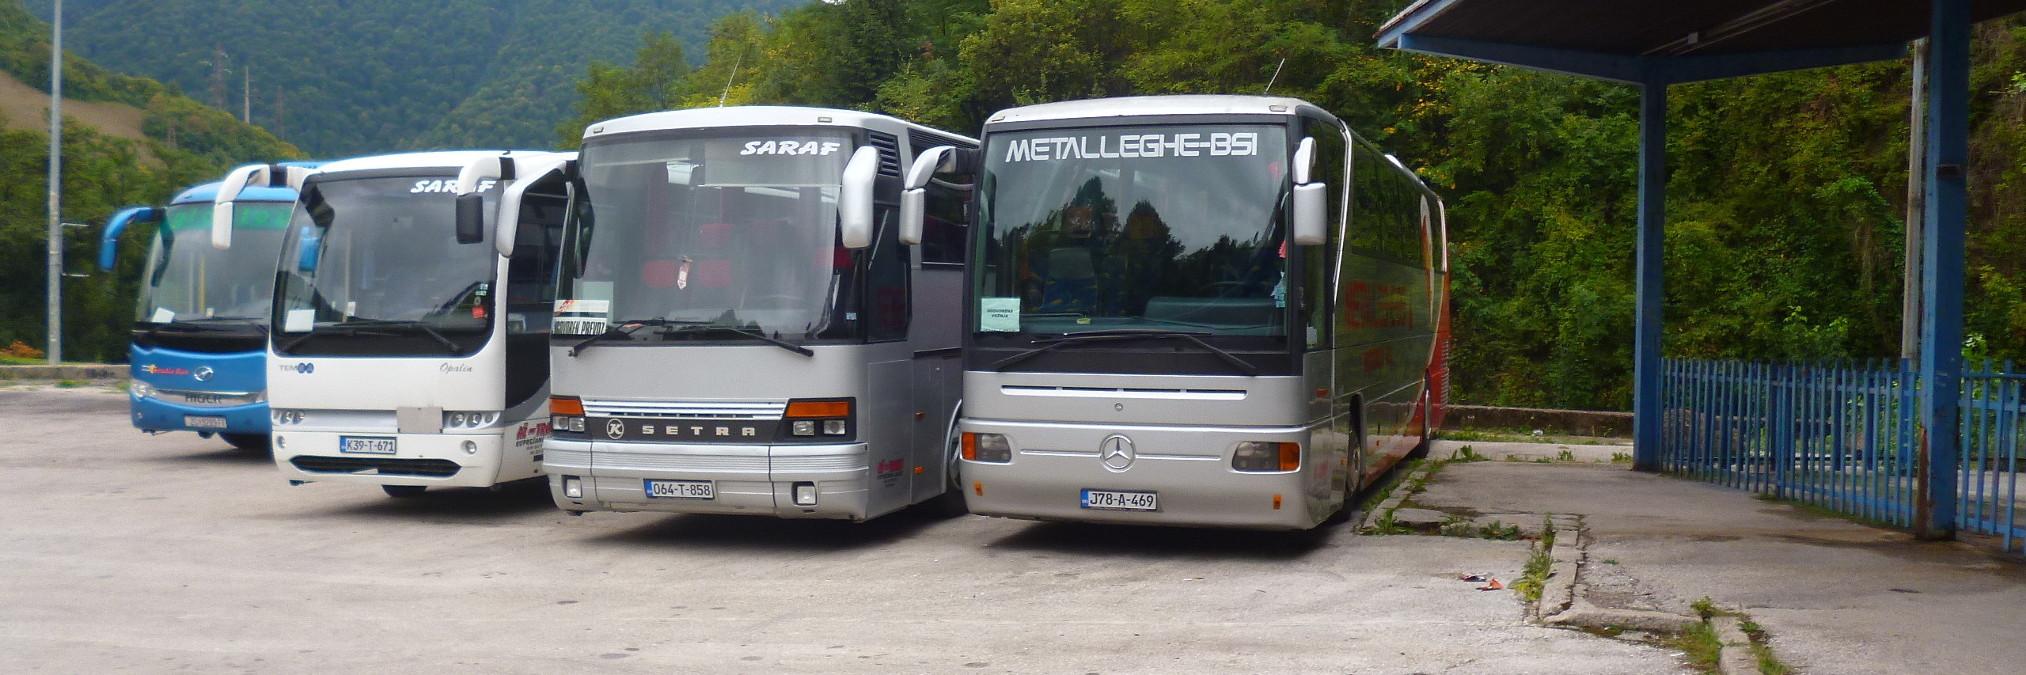 Транспорт в Боснии и Герцеговине